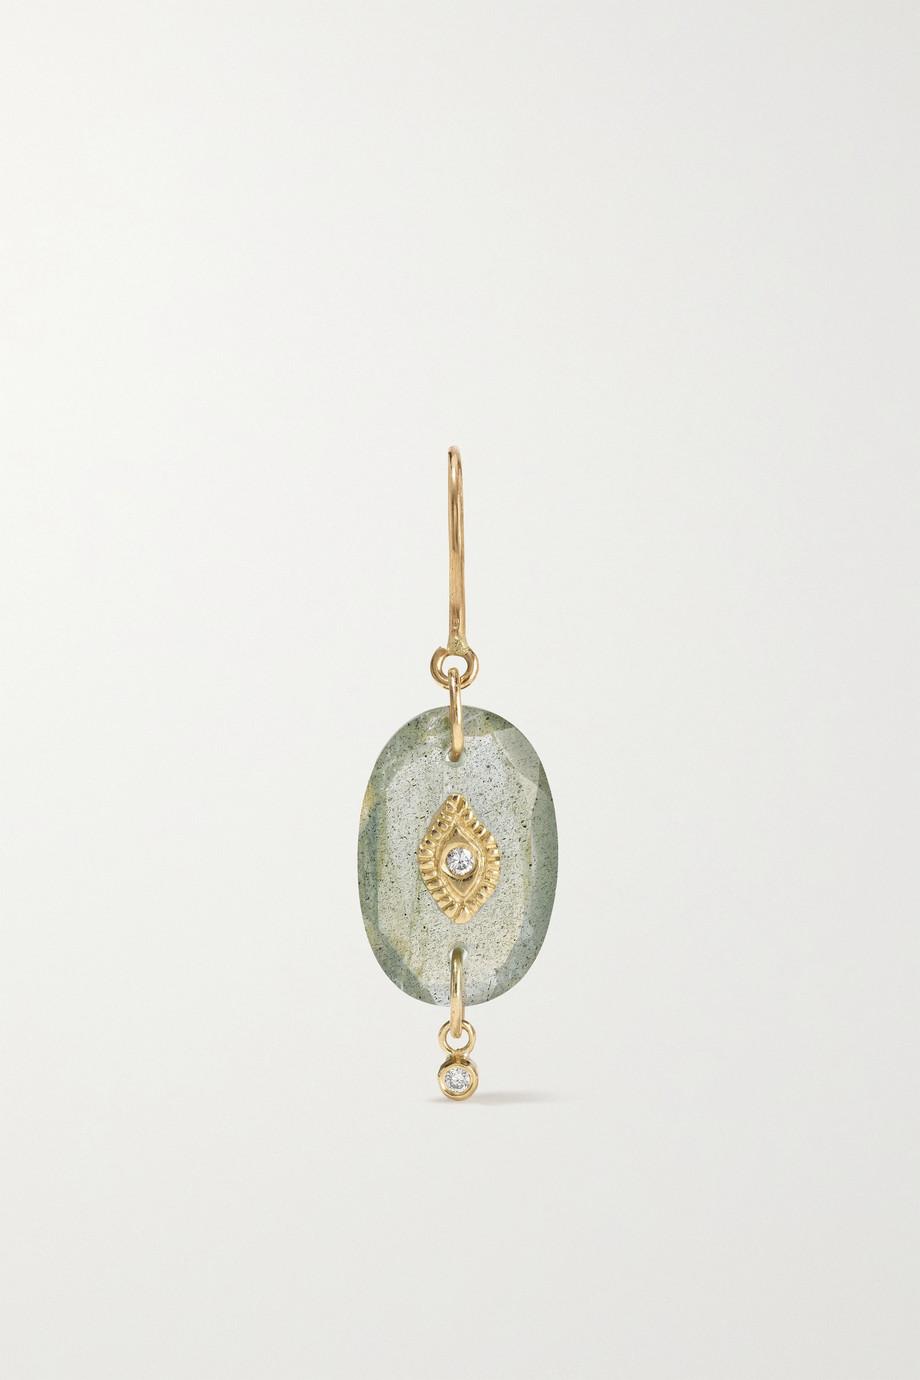 Pascale Monvoisin Souad N°2 9-karat gold, labradorite and diamond earring